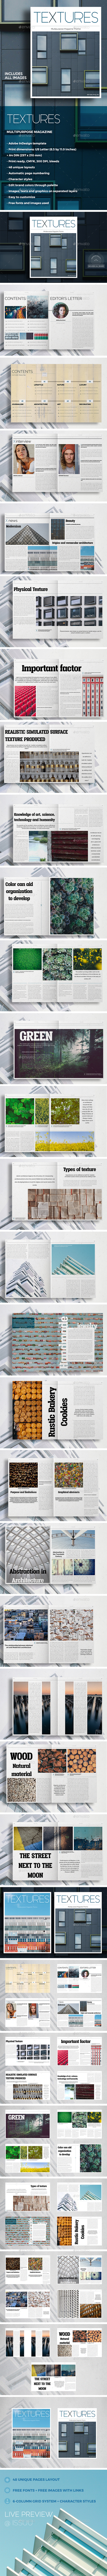 Textures Magazine - Magazines Print Templates